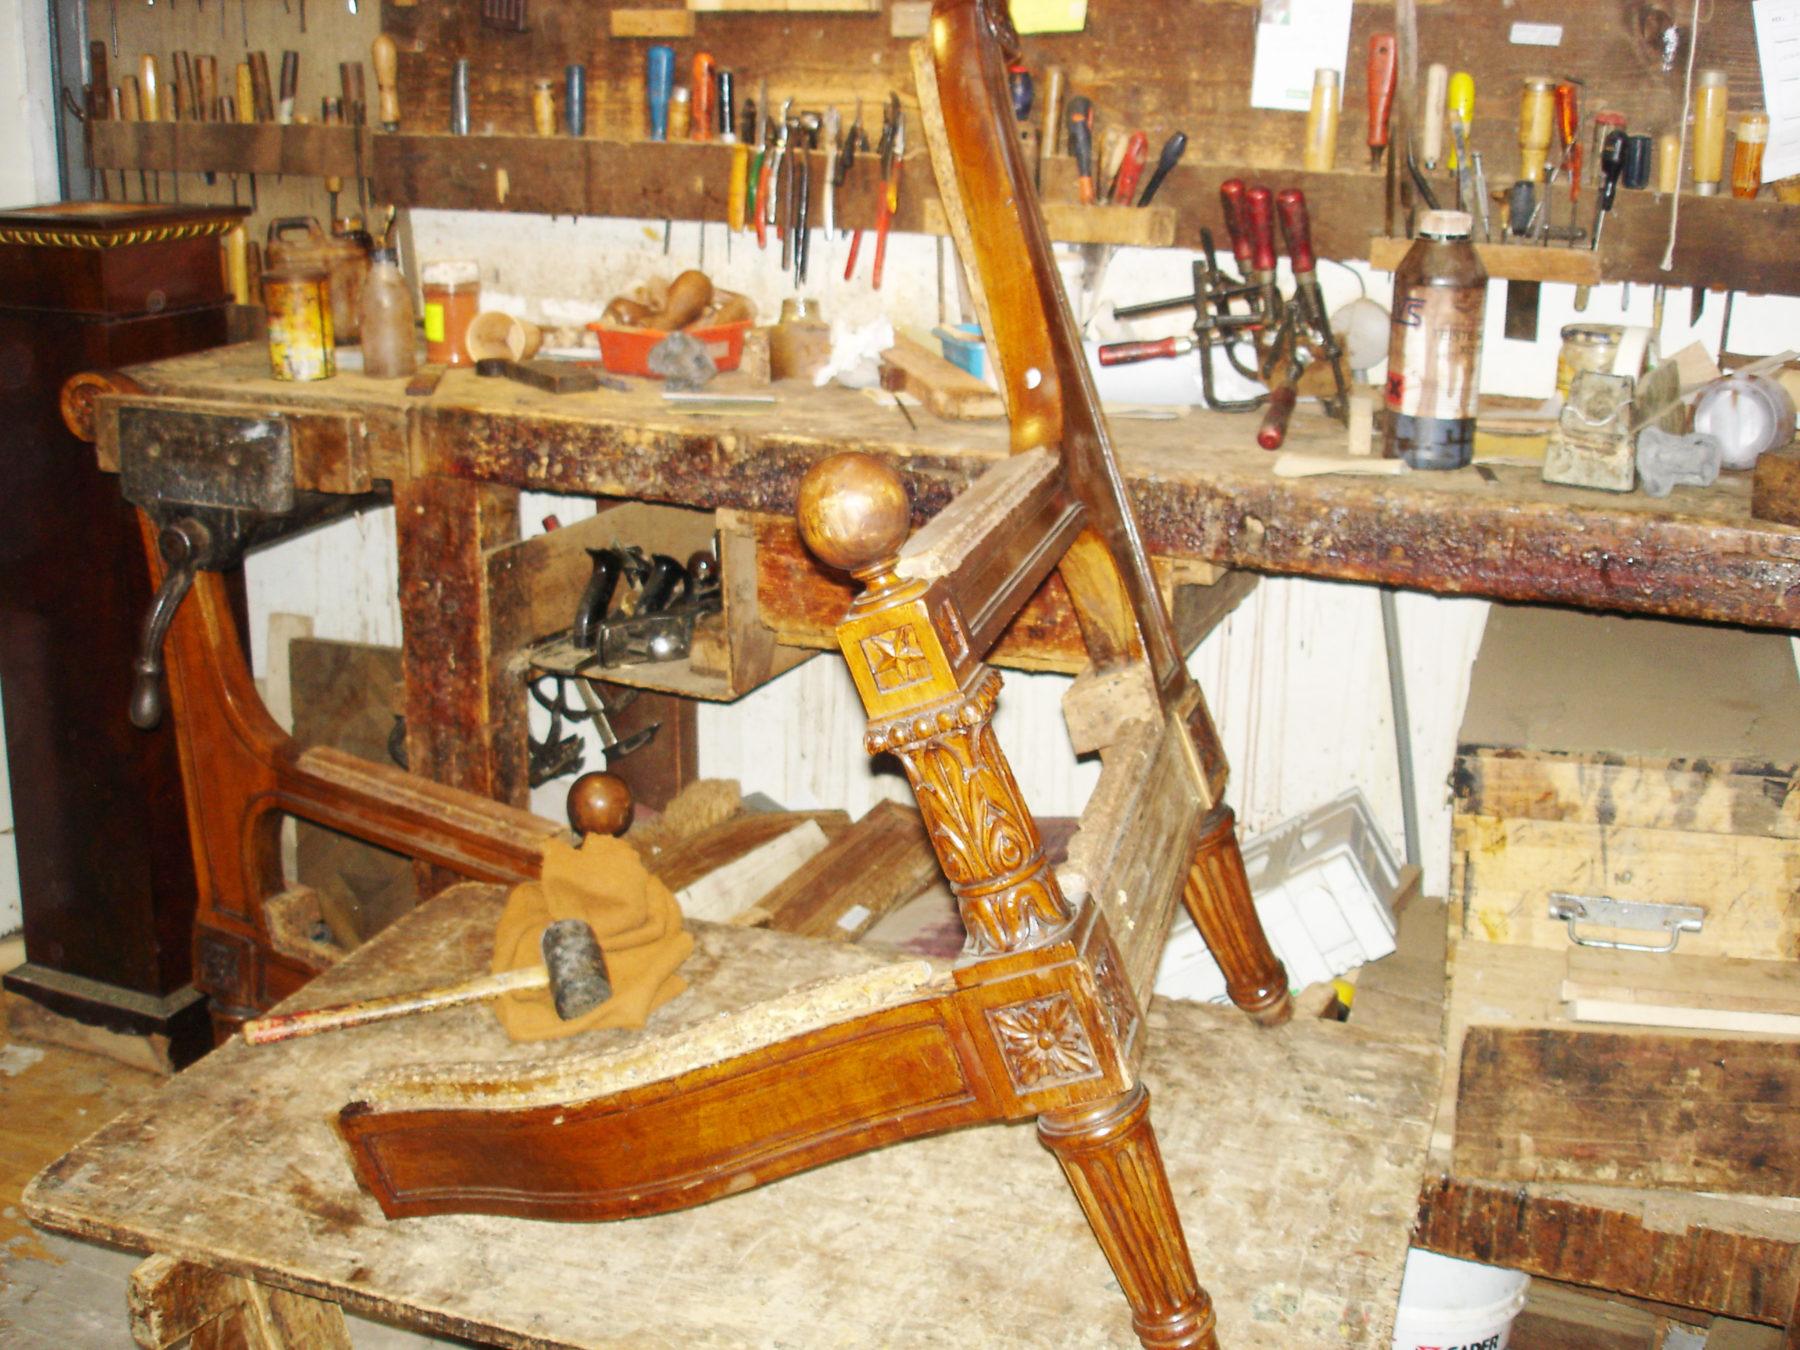 Détail chaise restauration - Luc Vaganay